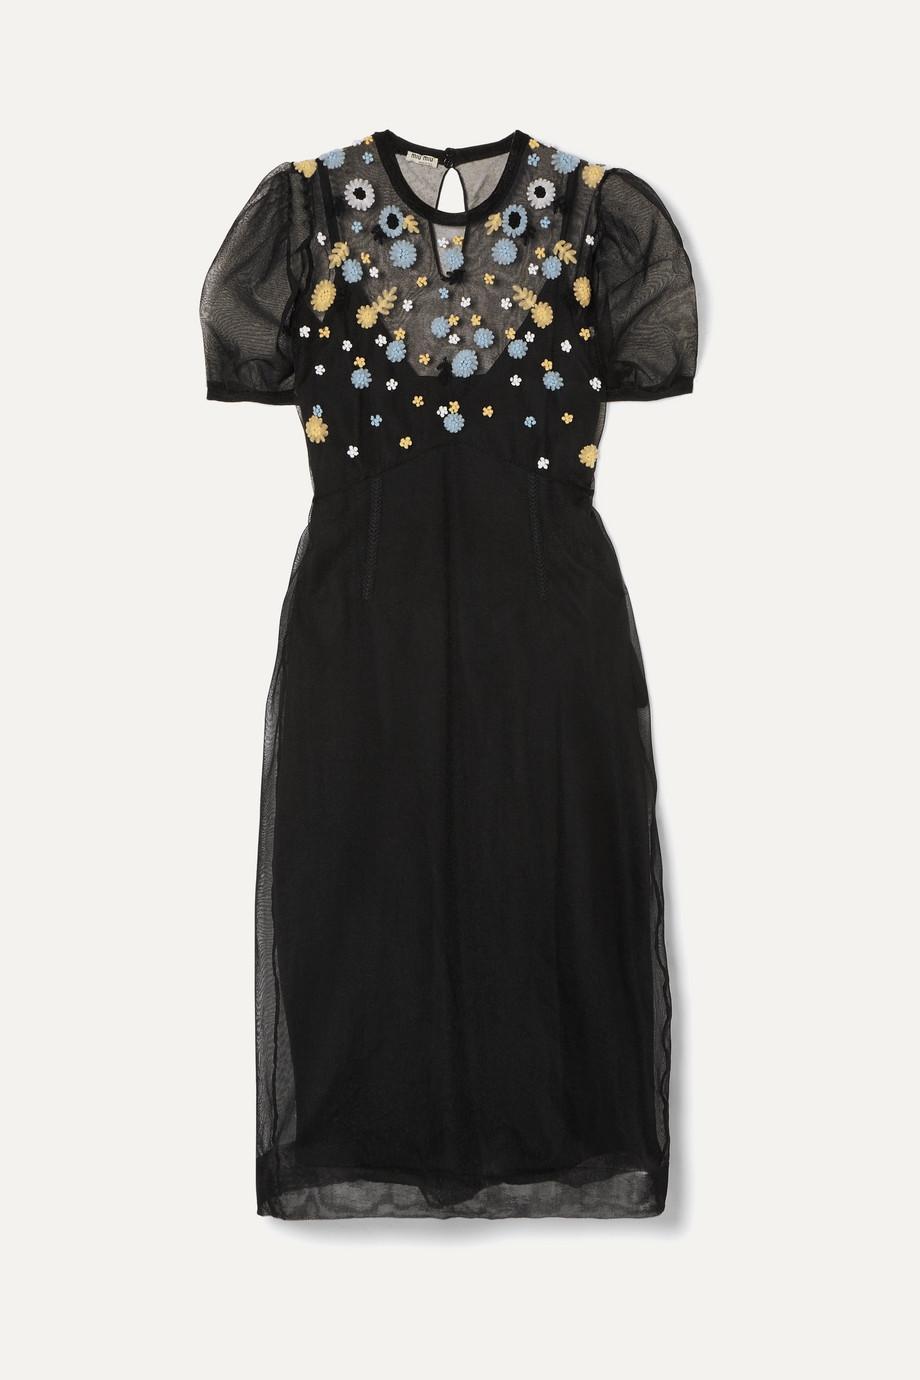 Miu Miu | Embroidered tulle midi dress | NET-A-PORTER.COM